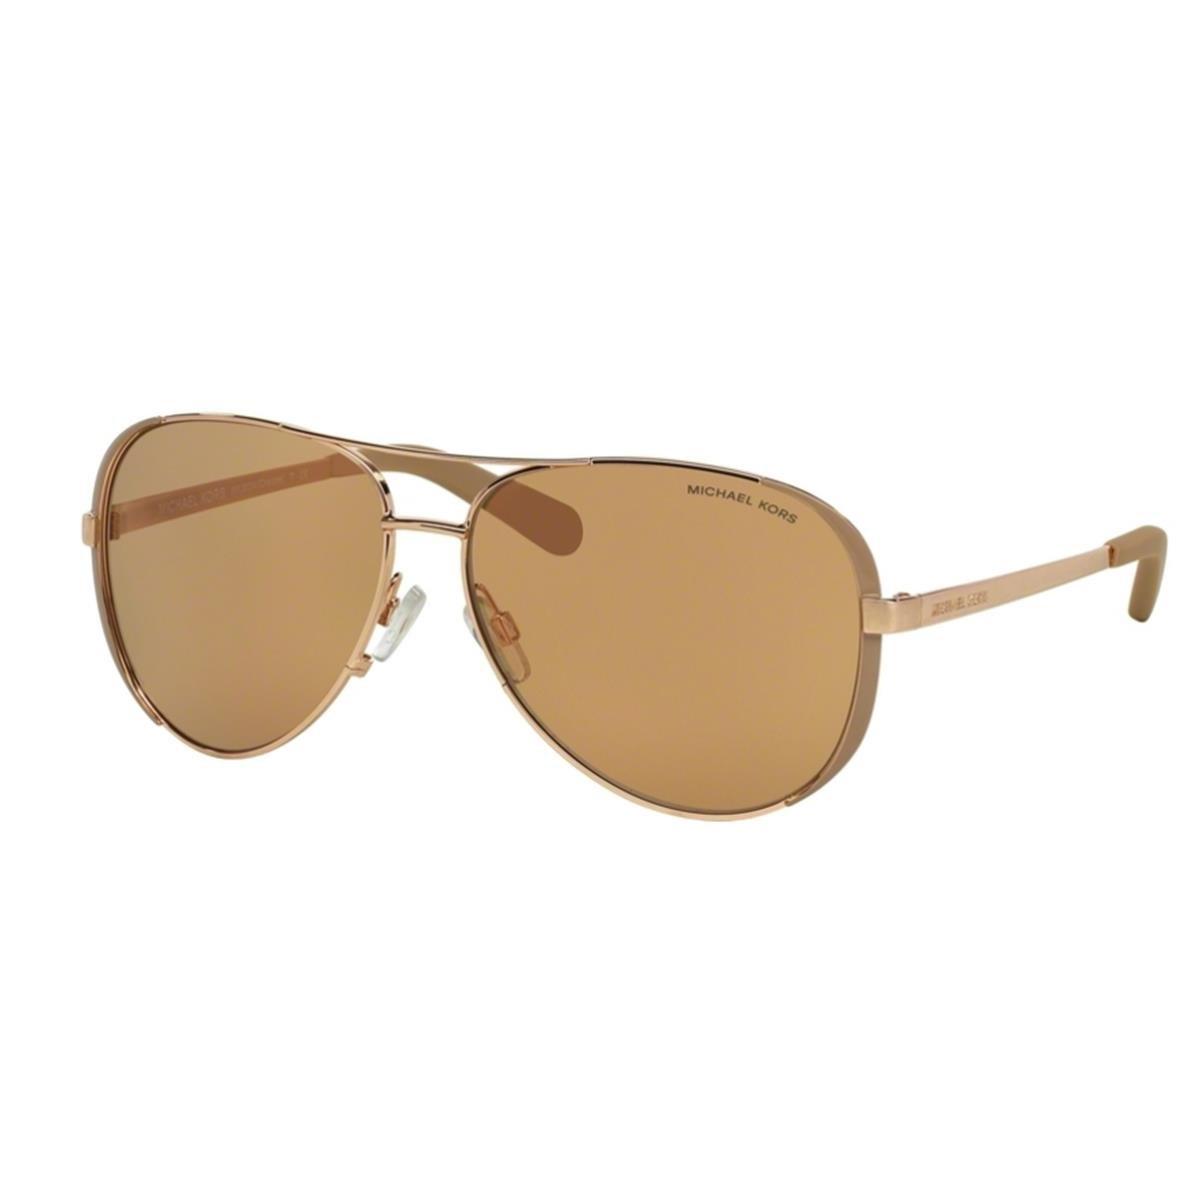 TALLA 59. Michael Kors Chelsea, Gafas de Sol Unisex